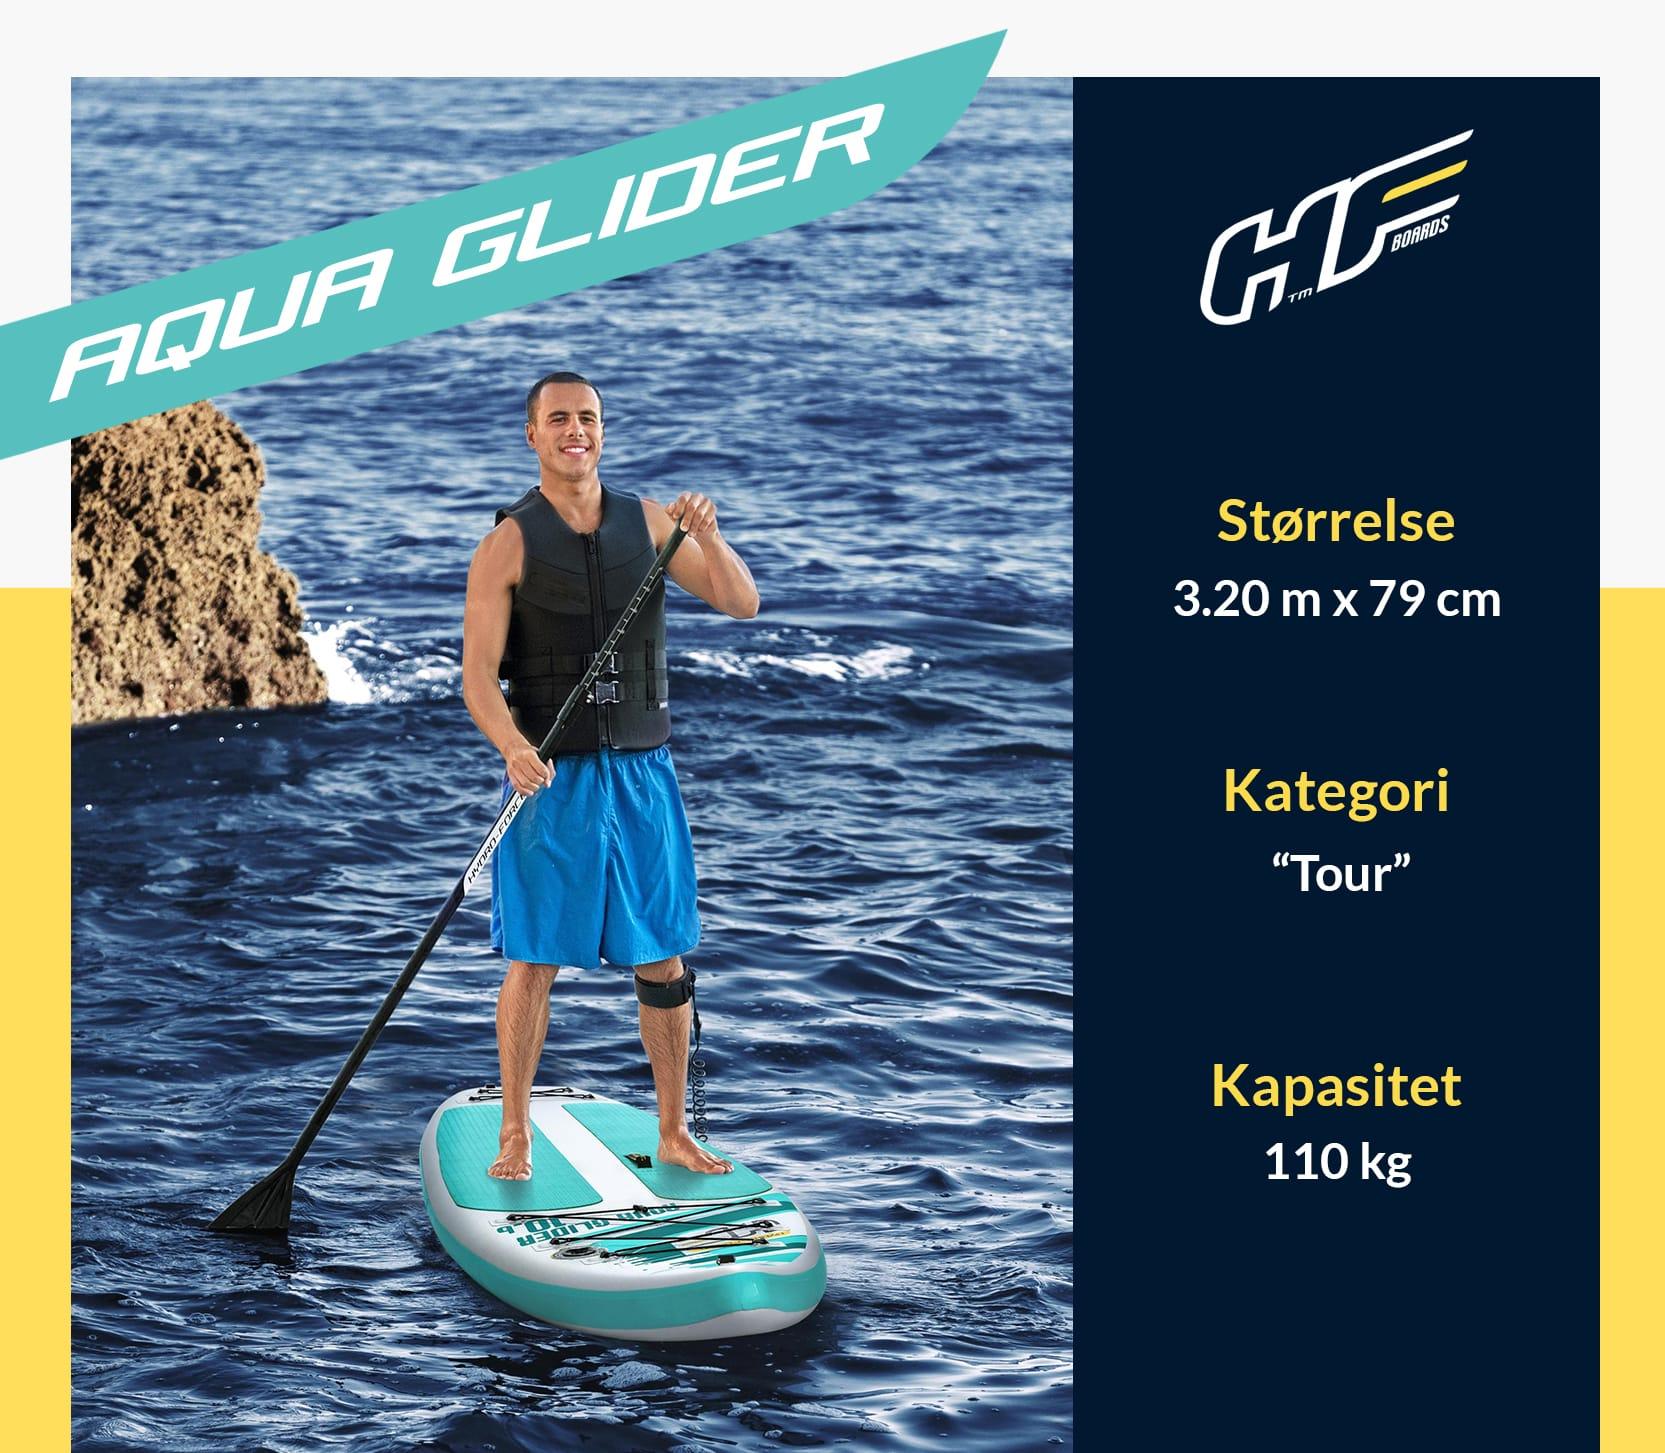 Aqua Glider Paddleboard